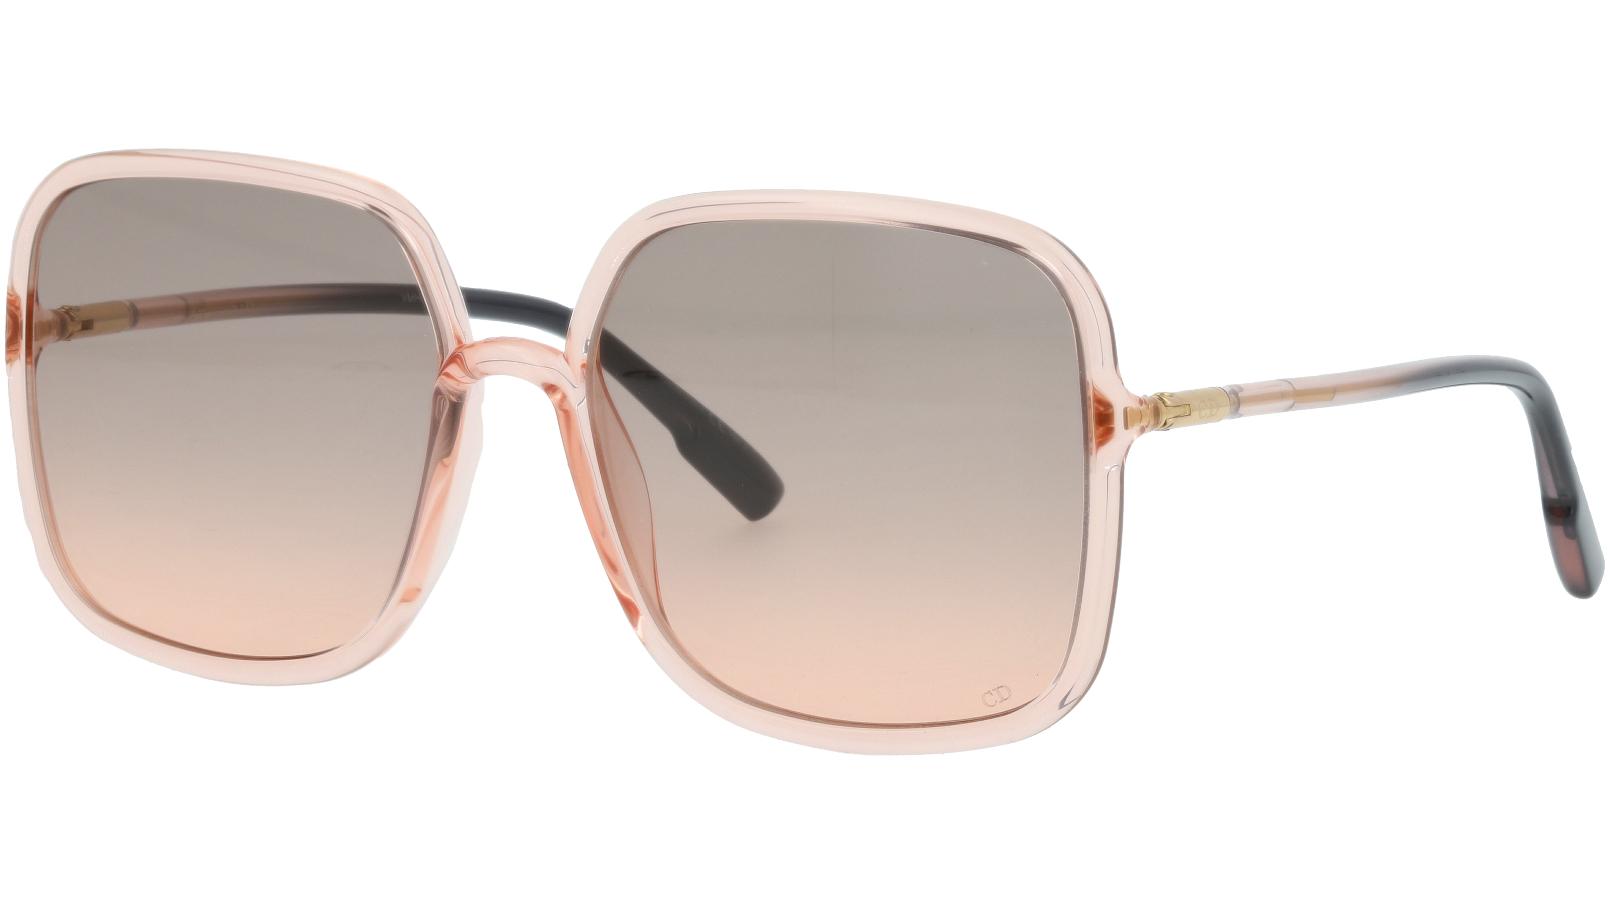 DIOR SOSTELLAIRE1 1N5FF 59 CORAL Sunglasses